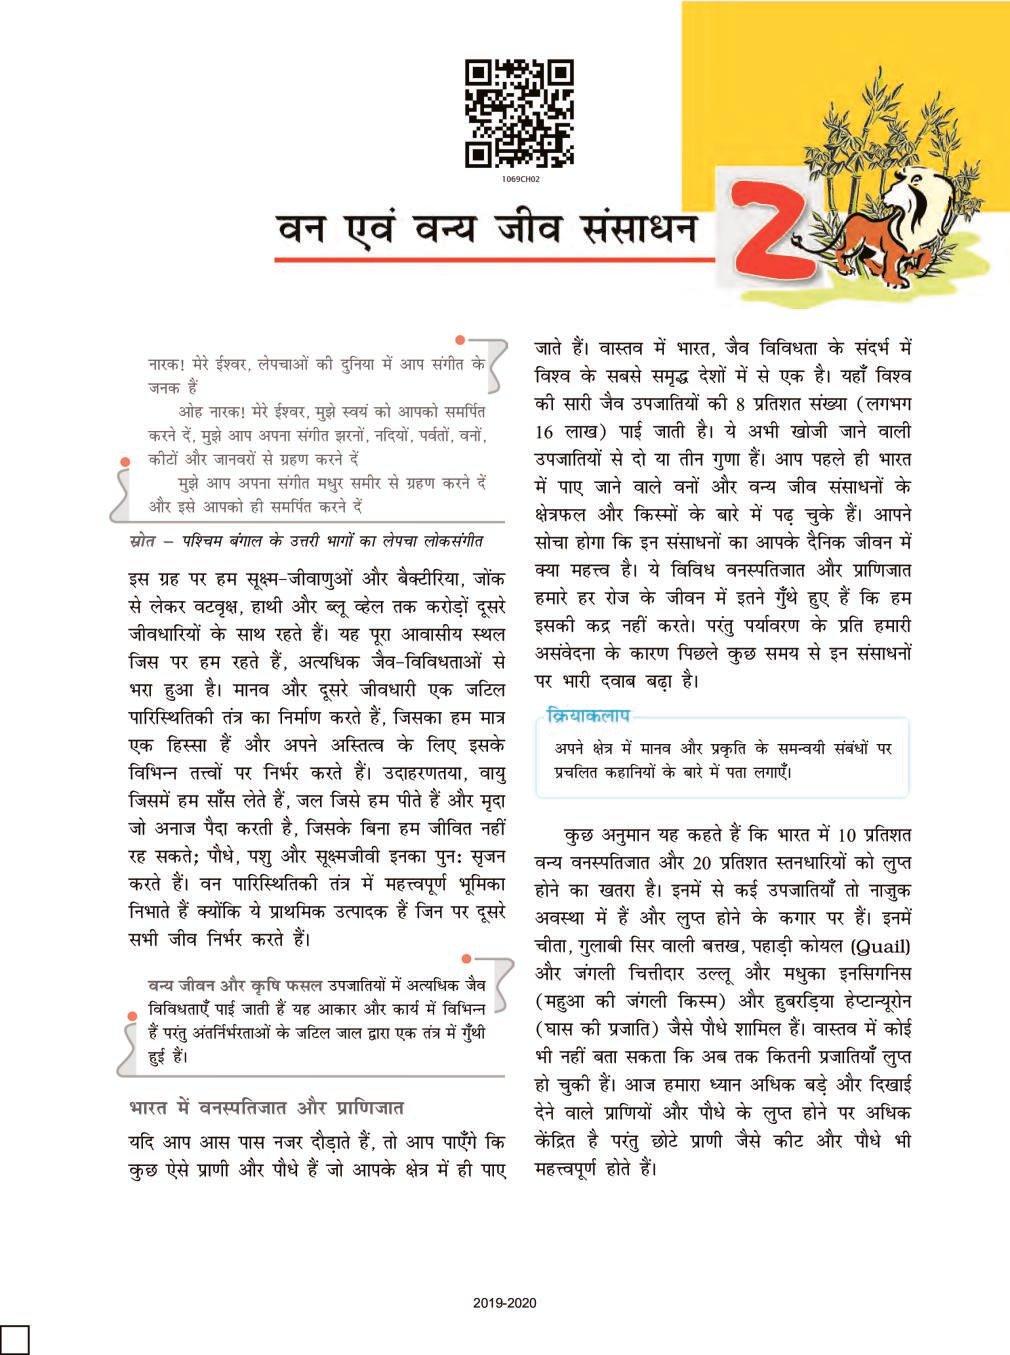 NCERT Book Class 10 Social Science (भूगोल) Chapter 2 वन एवं वन्य जीव संसाधन - Page 1